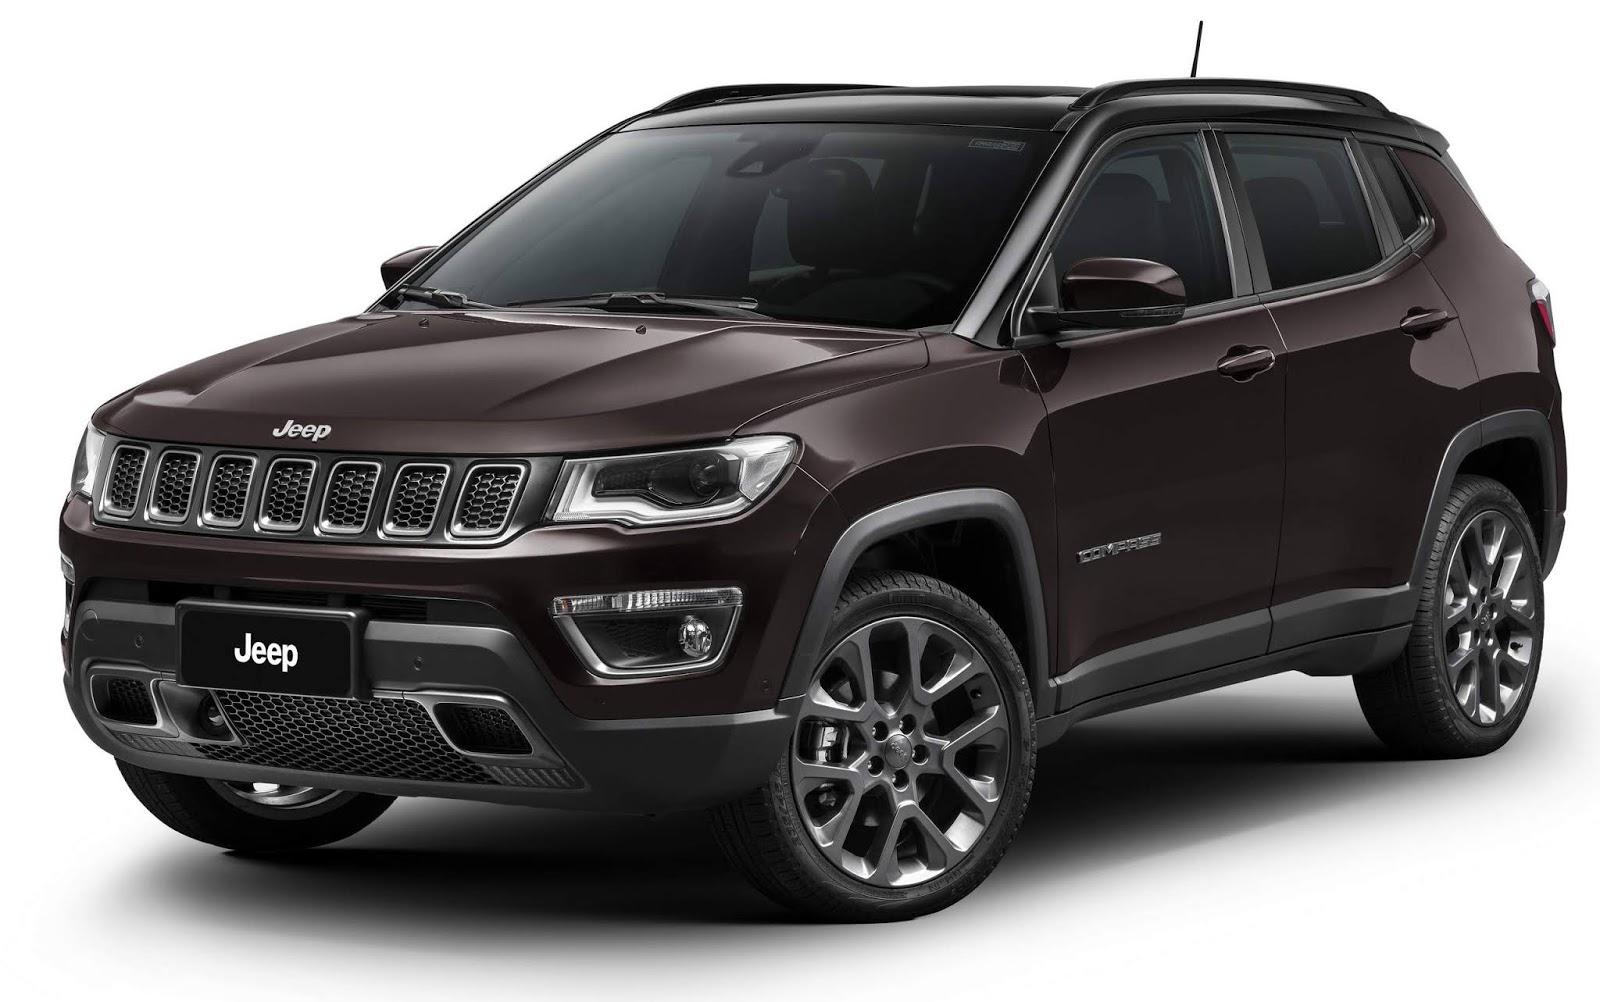 Jeep Estende Descontos De Renegade E Compass Para Pcd Car Blog Br